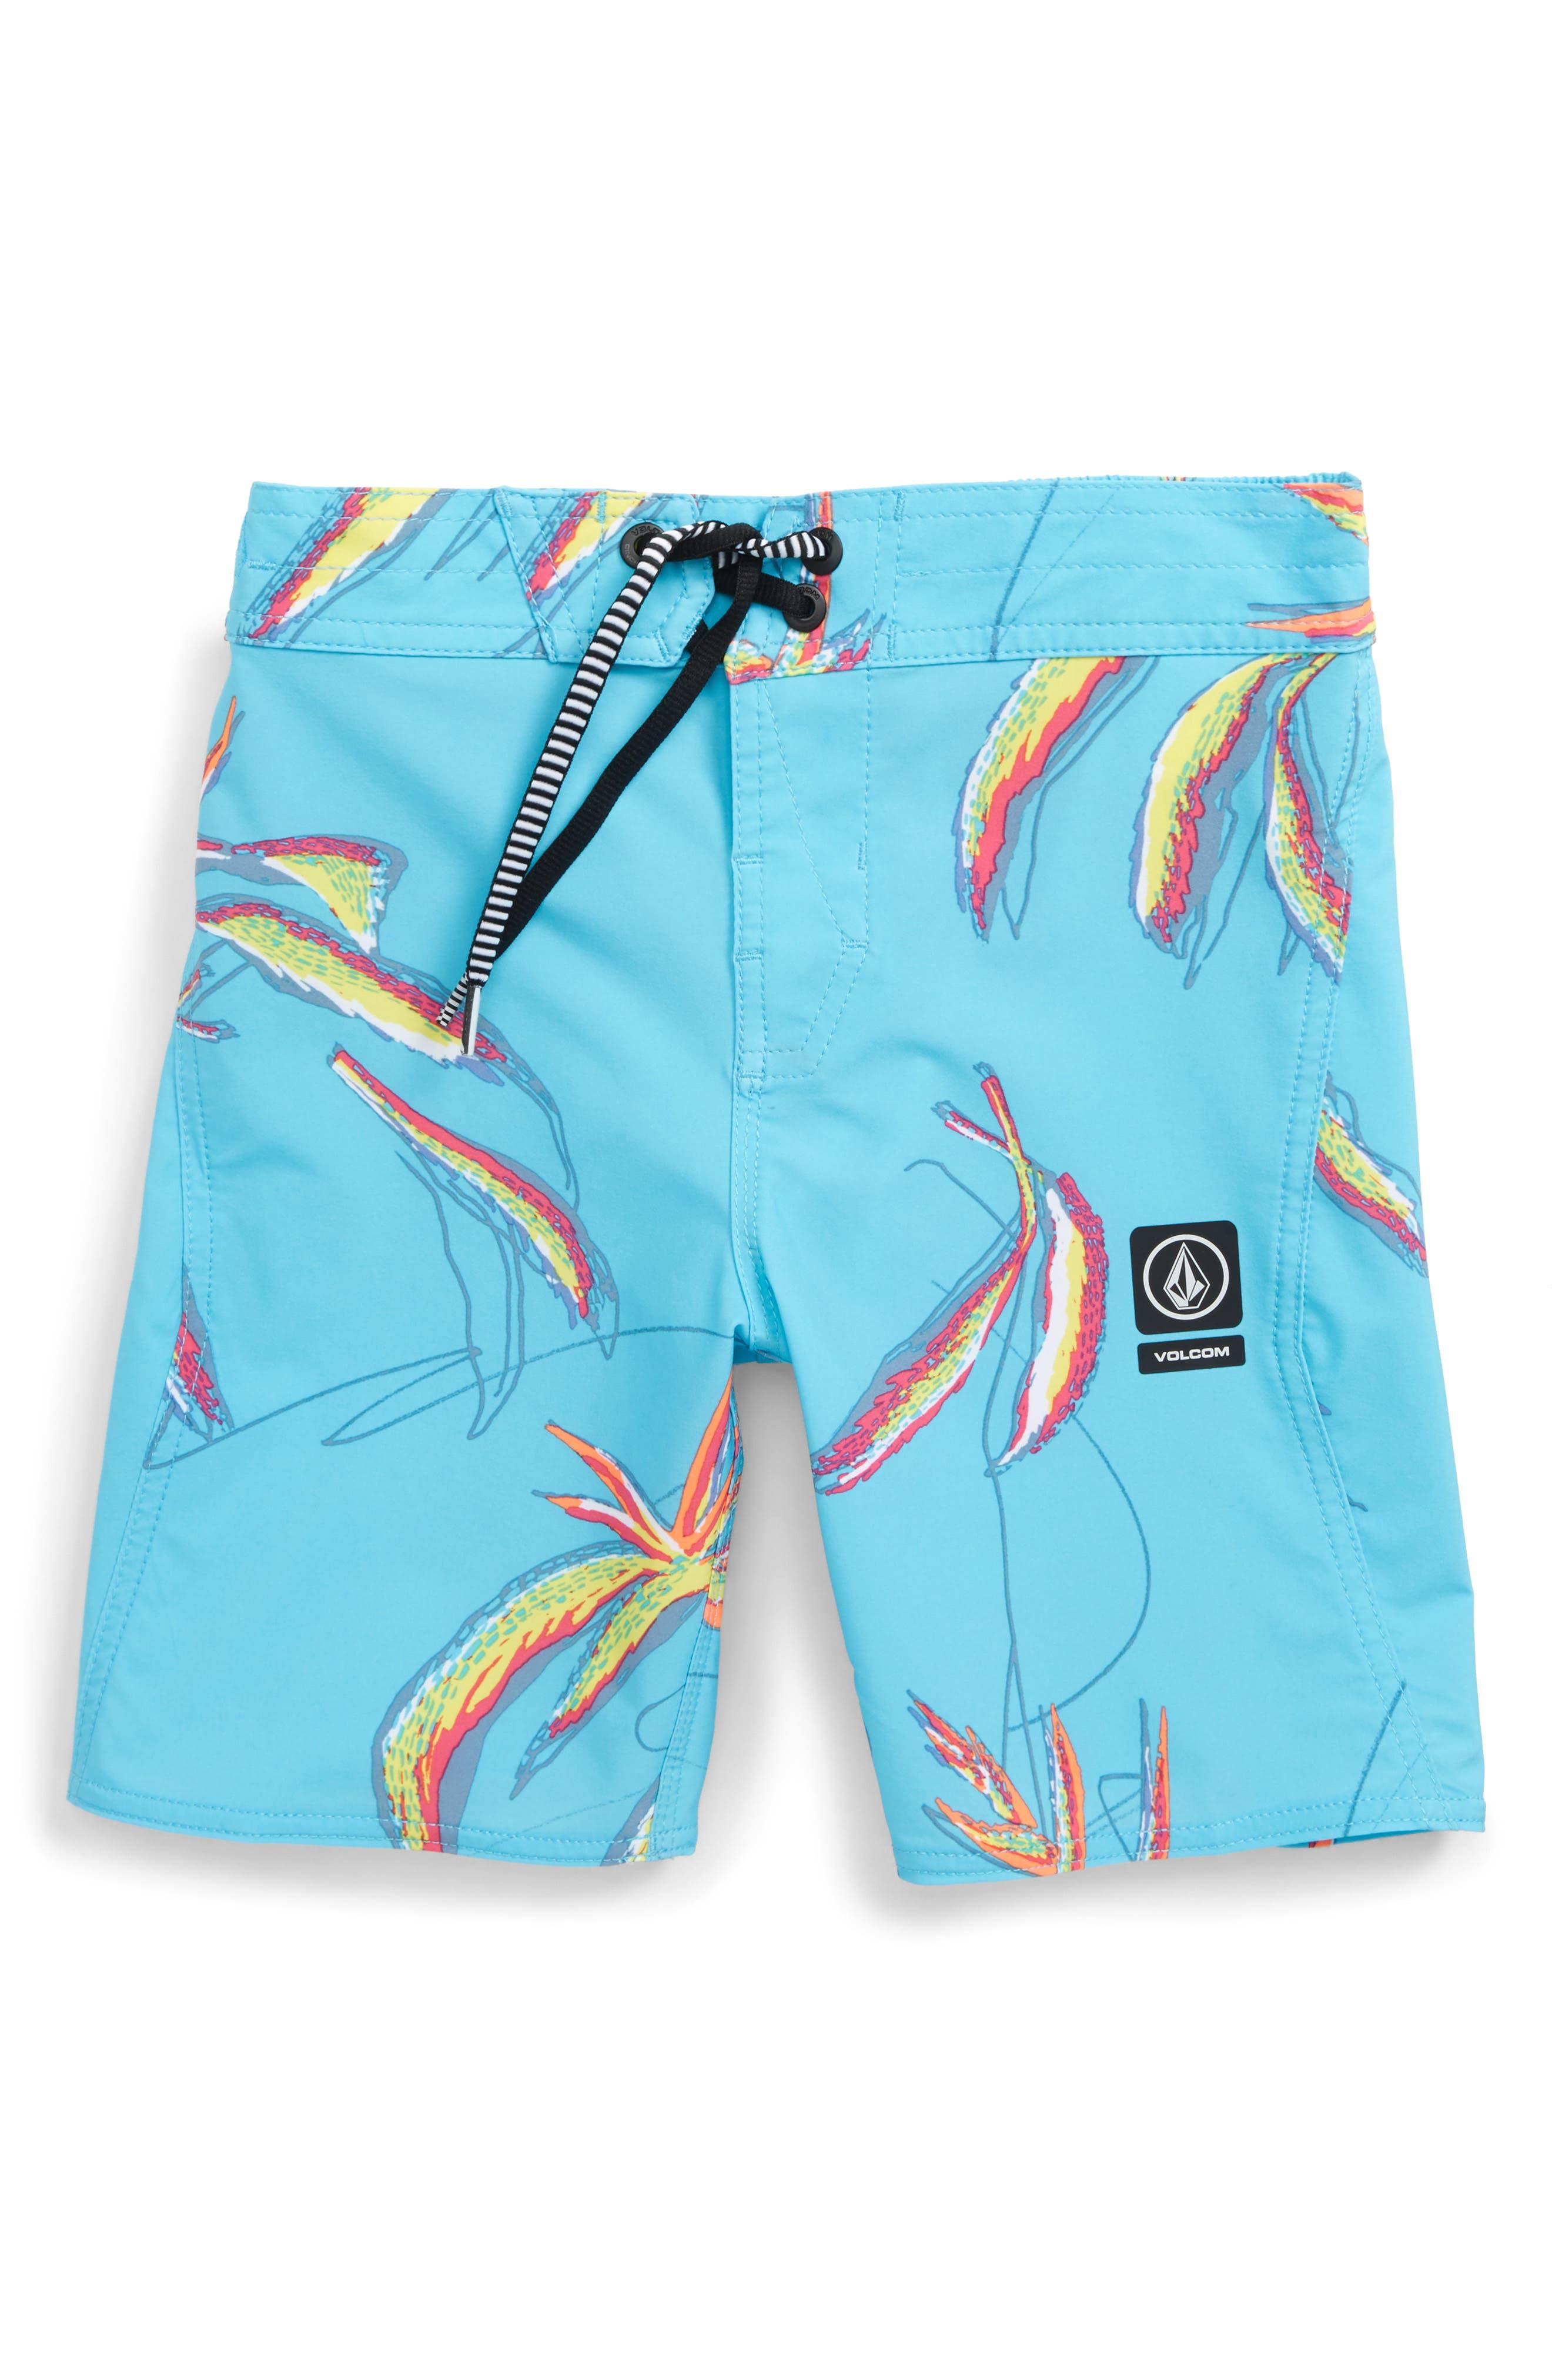 Tropical Print Board Shorts,                             Main thumbnail 1, color,                             DUSTY AQUA